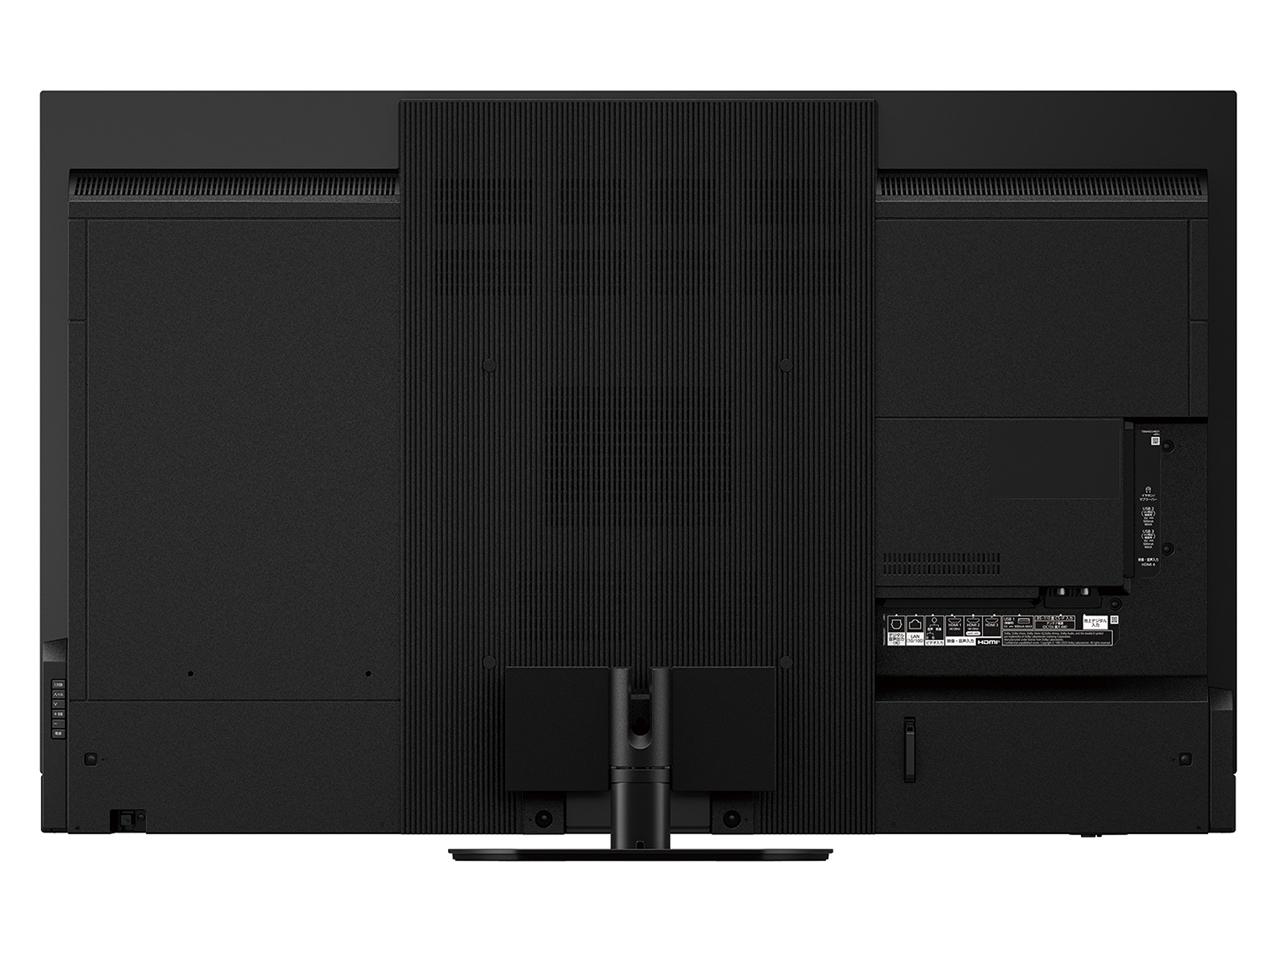 VIERA TH-55JZ2000 [55インチ] の製品画像